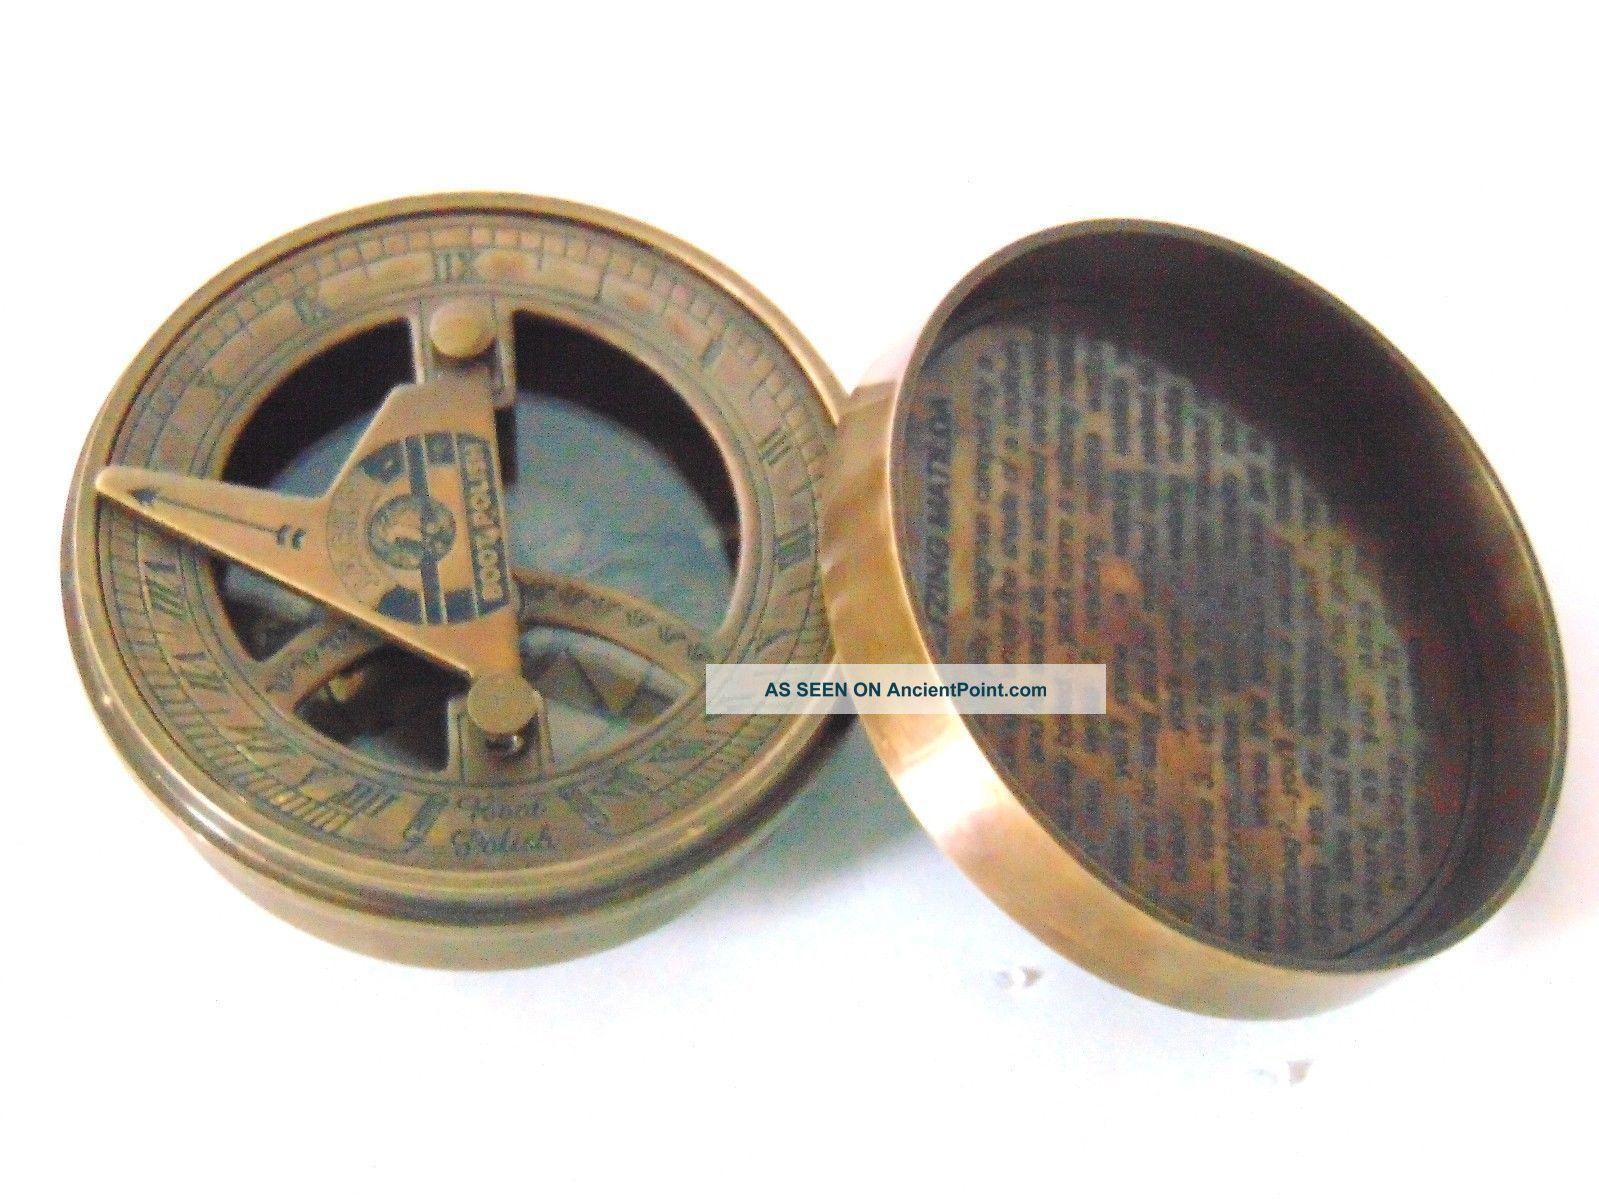 Vintage Nautical Brass Sundial Compass - Christmas Gift Sundial Compass Compasses photo